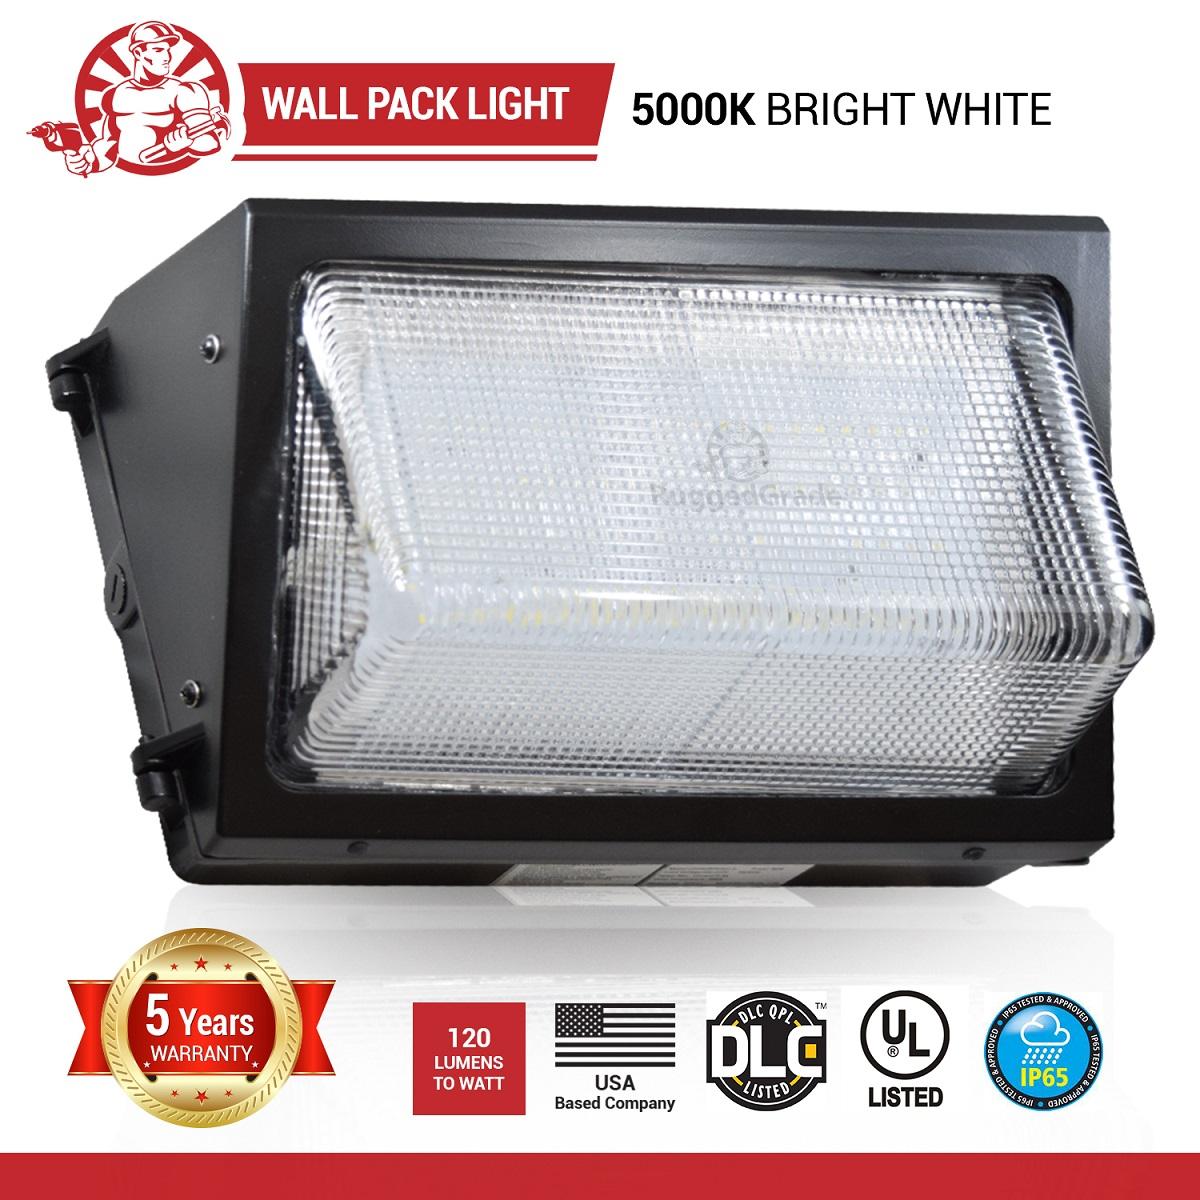 80 watt led wall pack 9100 lumens 5000k with ul and dlc wall quick view aloadofball Choice Image